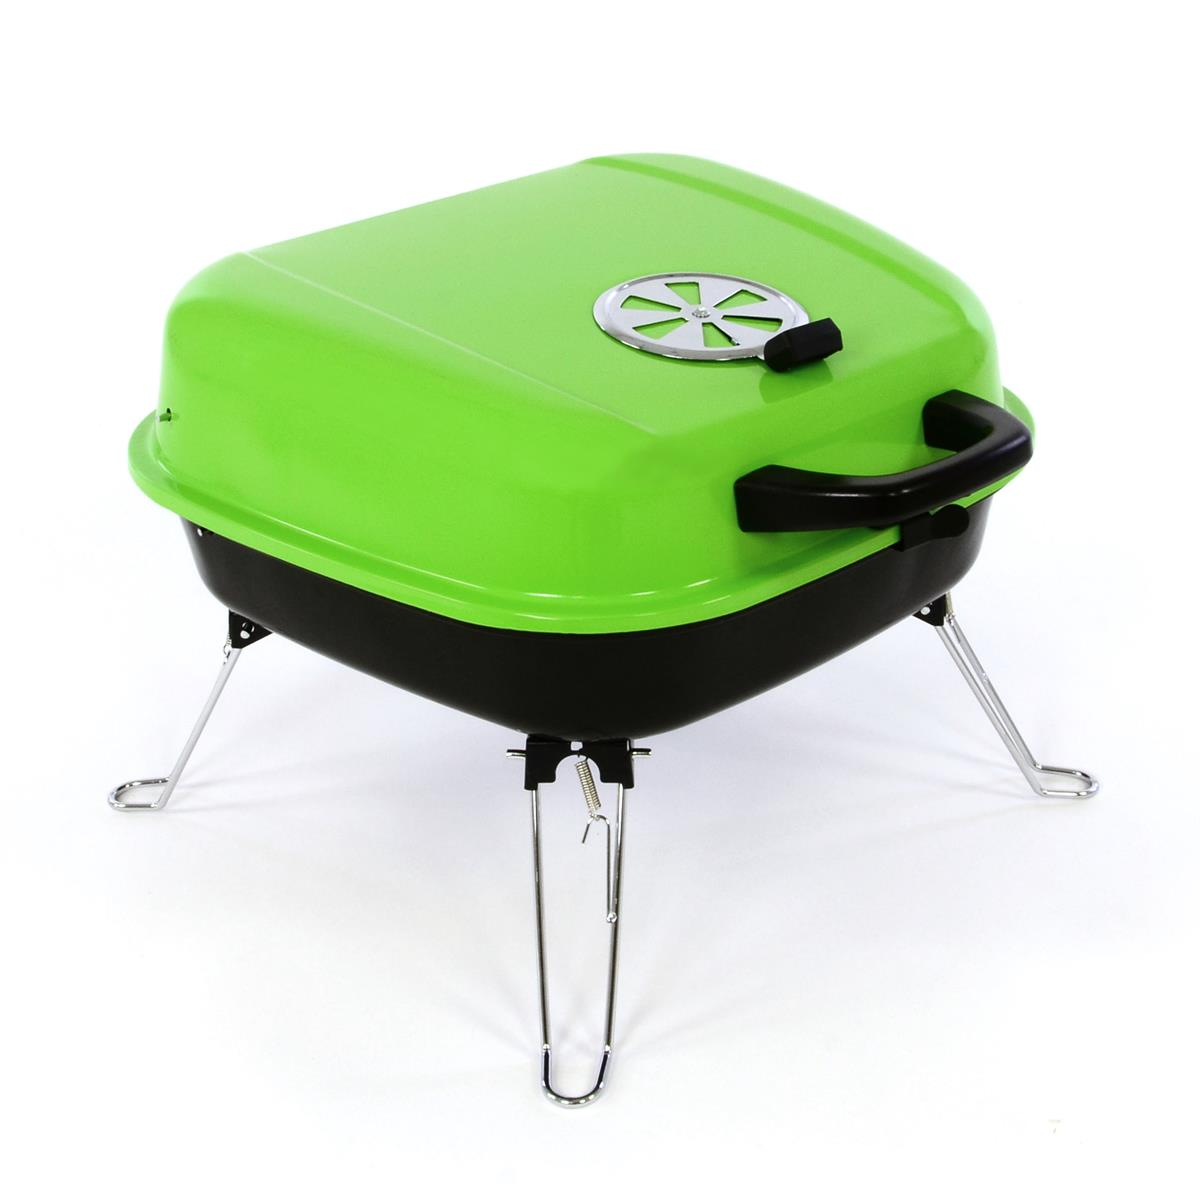 Koffergrill Holzkohlegrill BBQ Partygrill Minigrill grün Barbecue